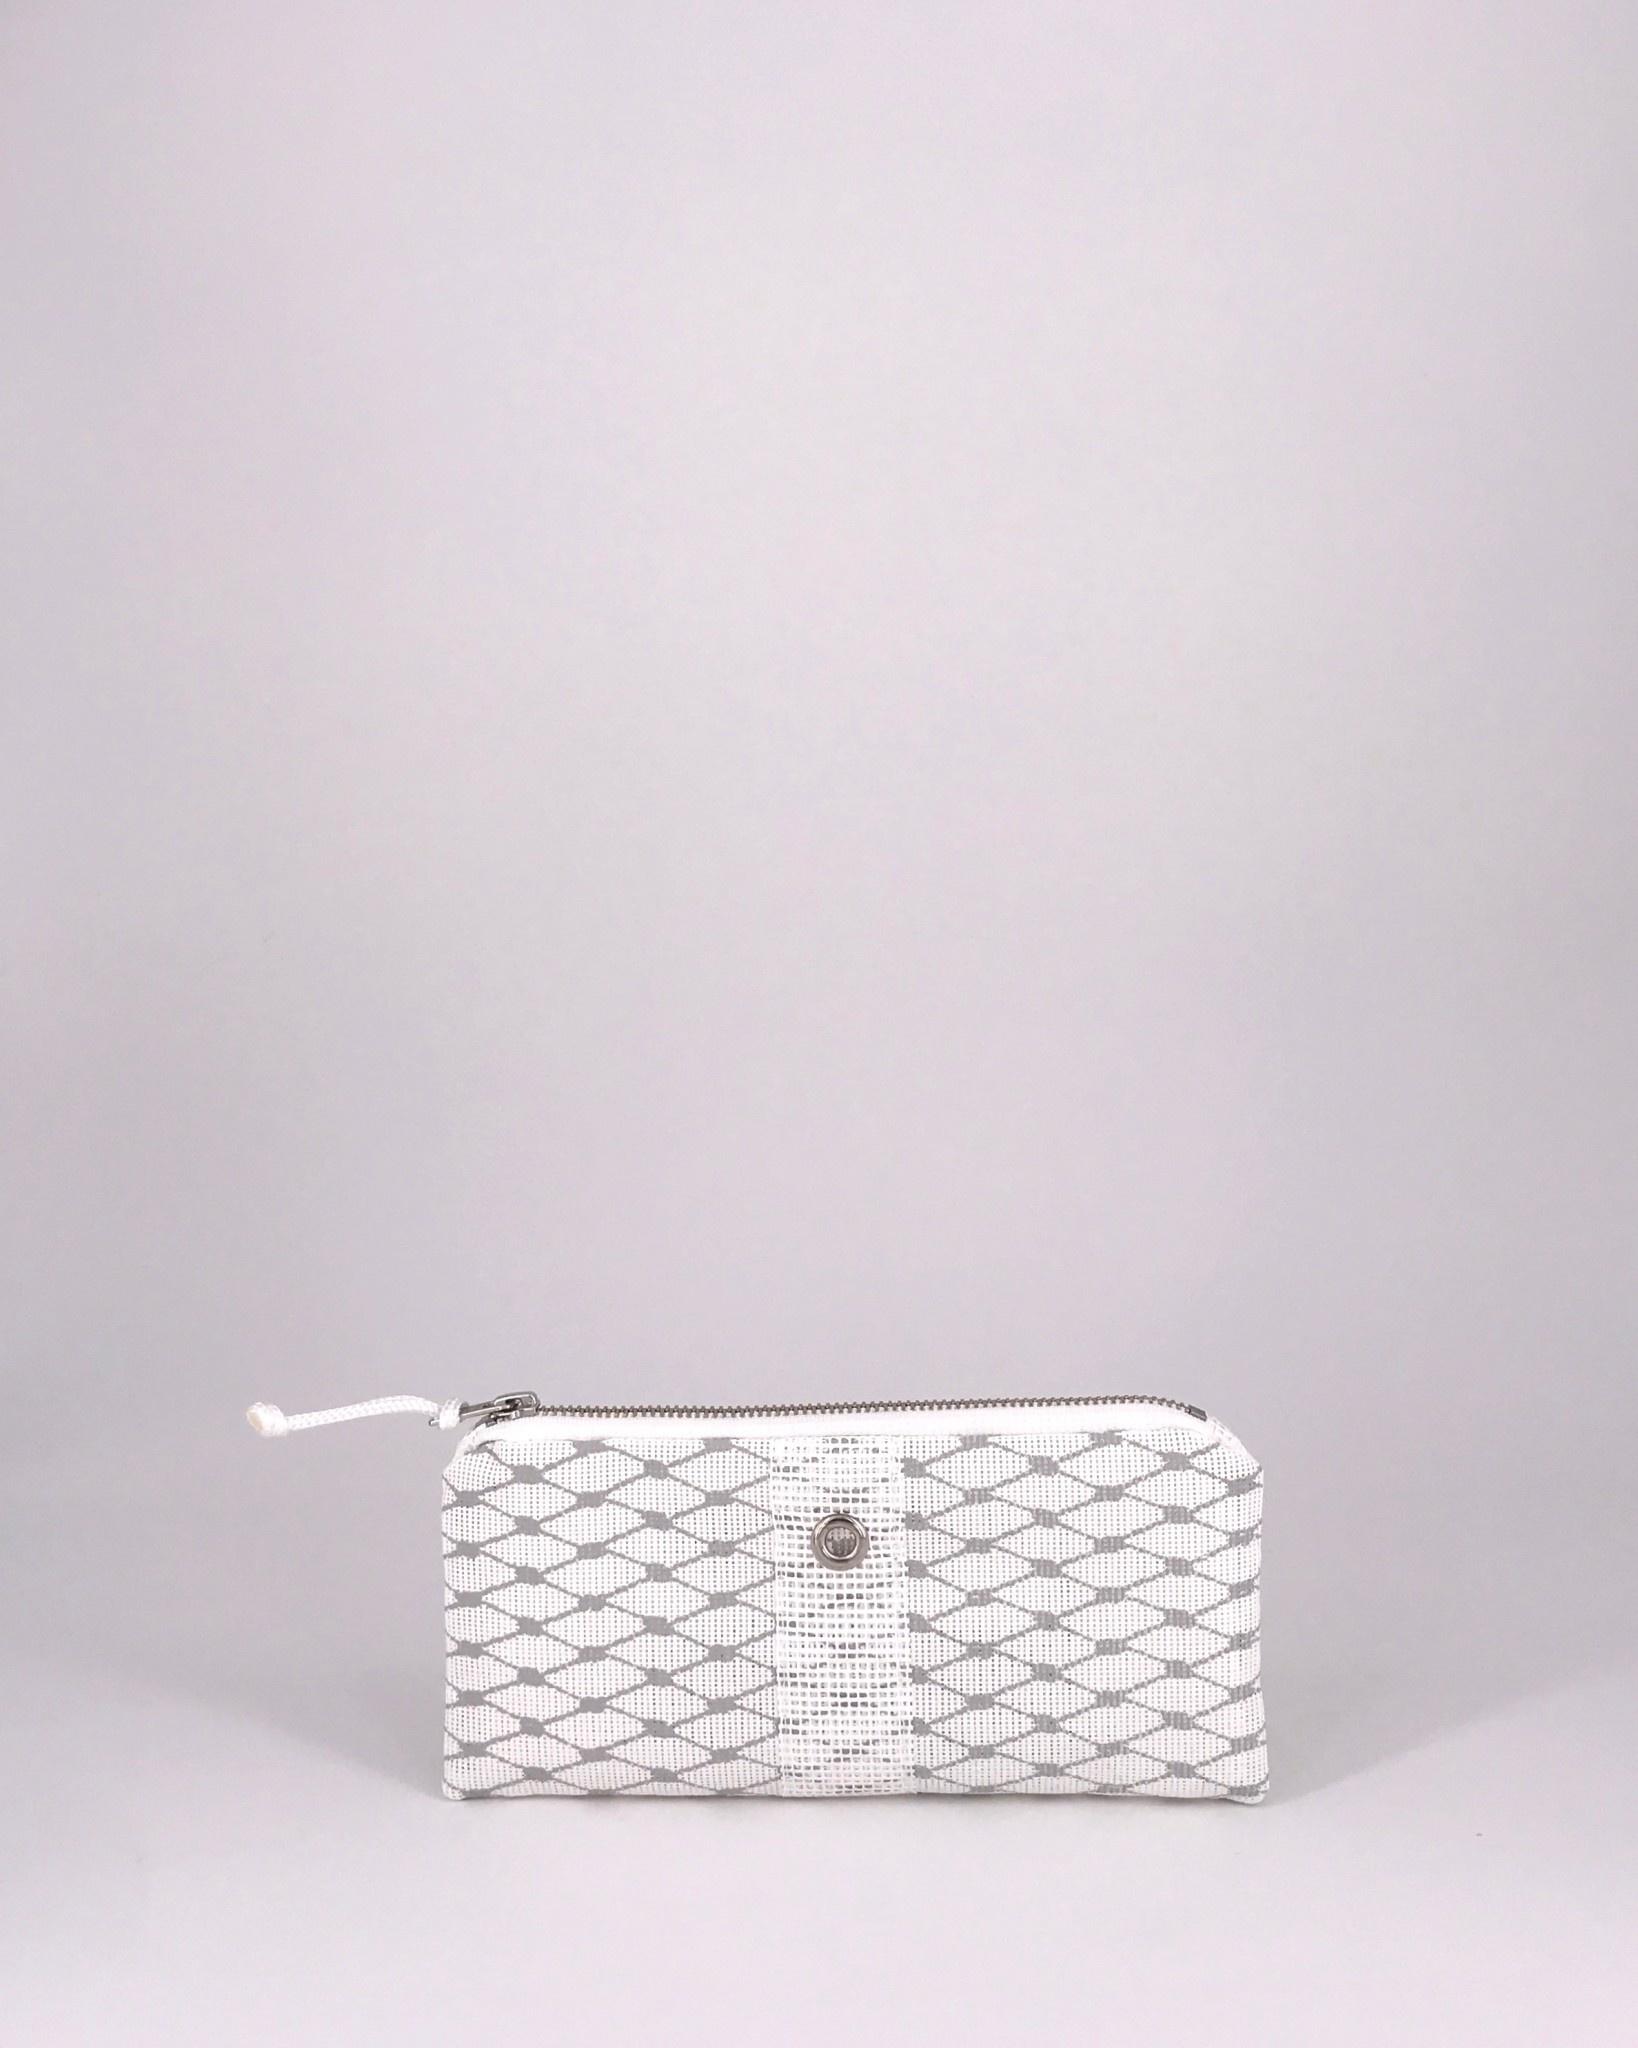 Alaina Marie ® Harbor Mist & White Mini Clutch